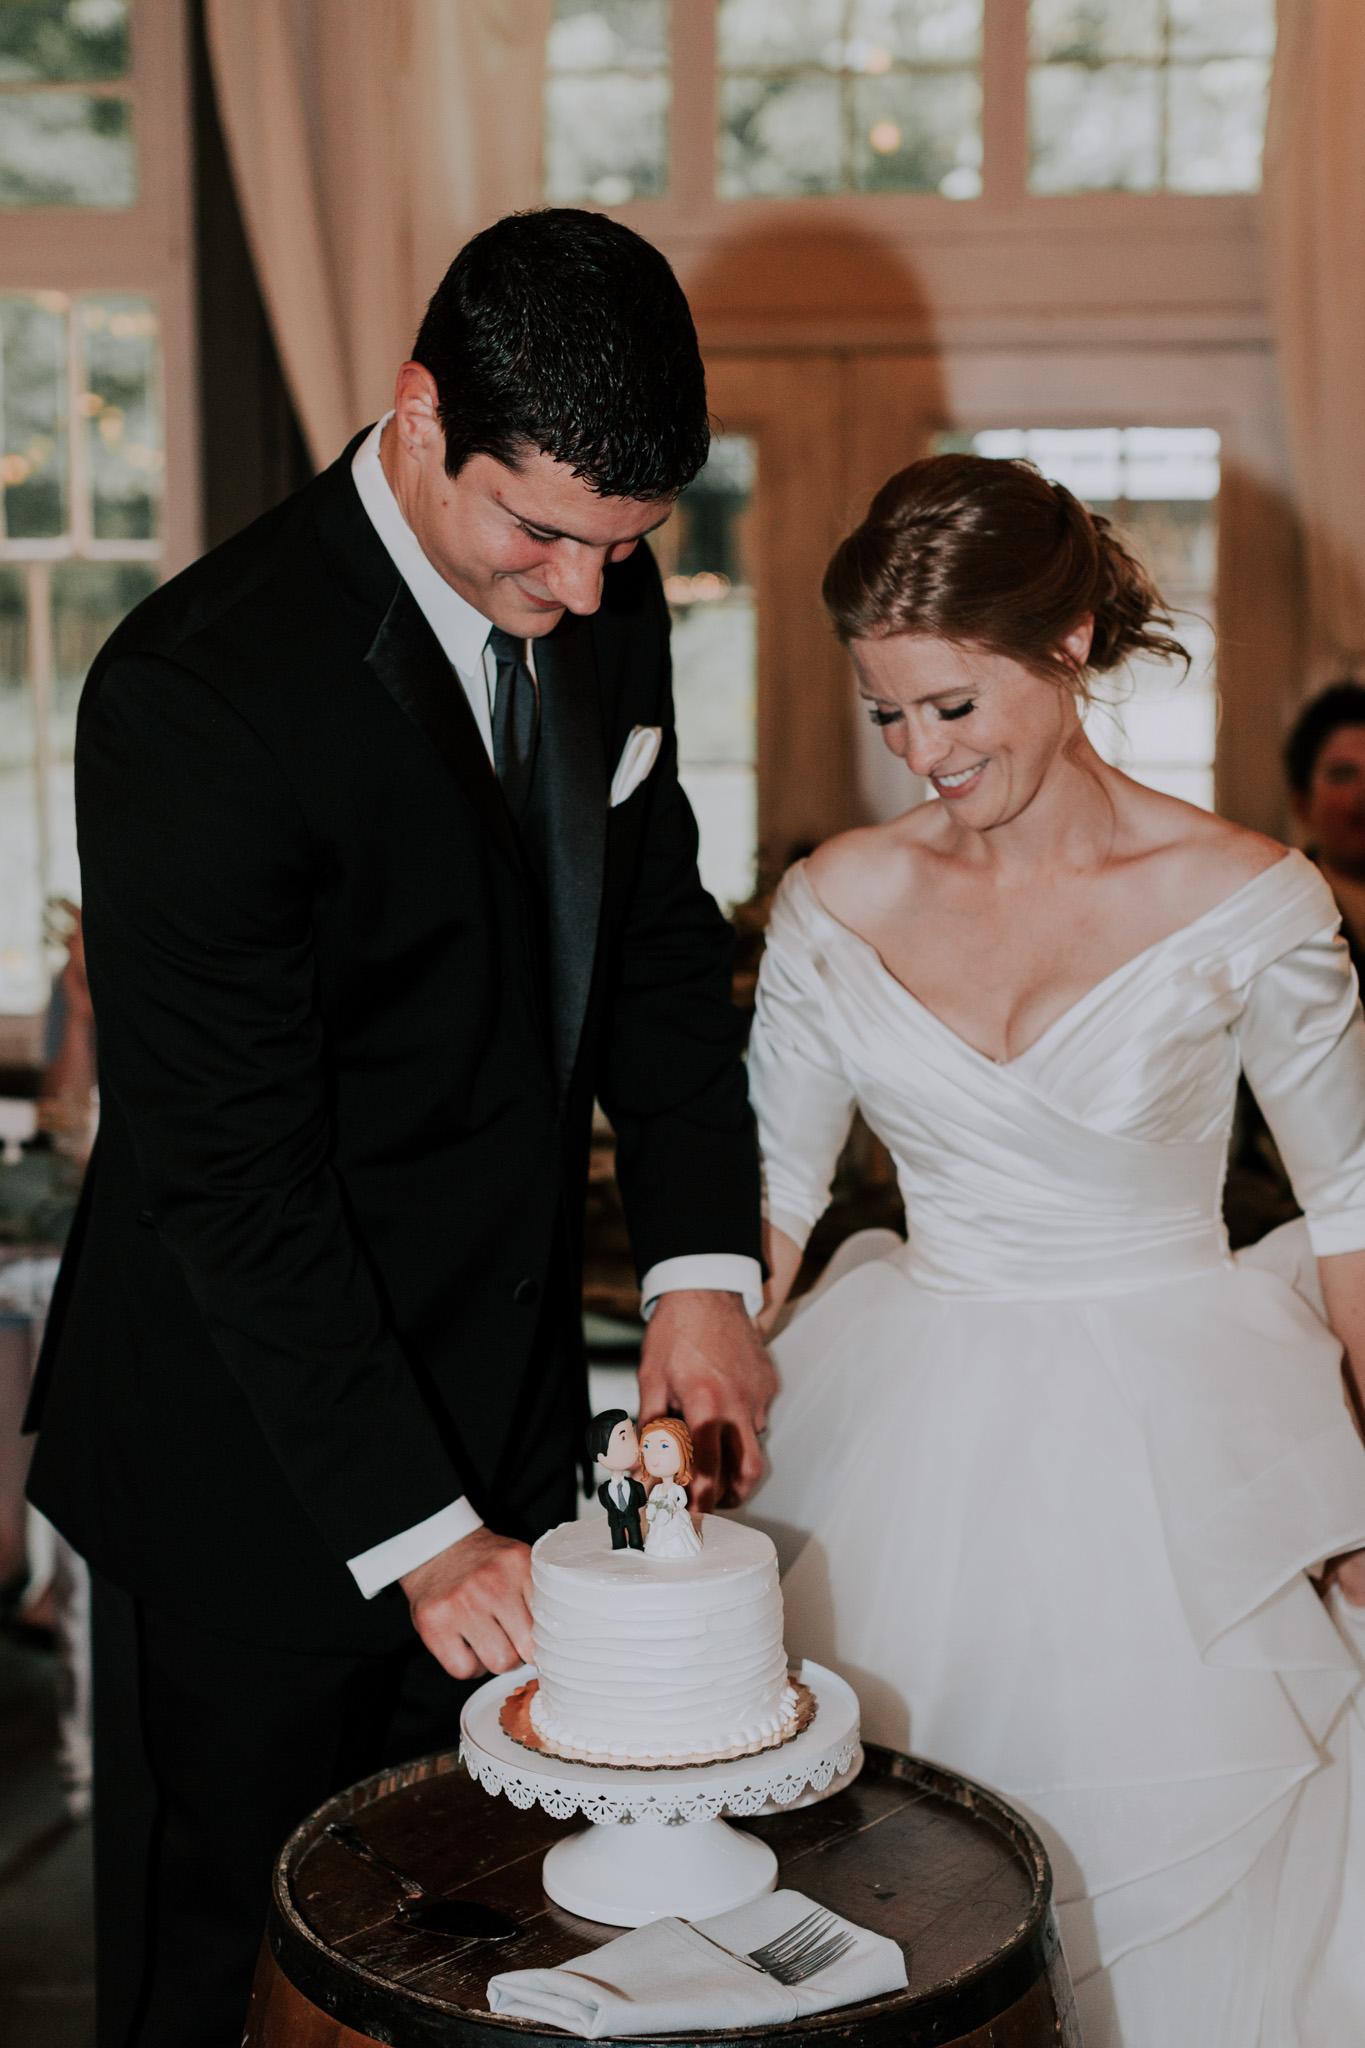 MillCreek-Wilde-Wedding-Barn-Michigan-Eliza-Eric-Vafa-Photo1045.jpg